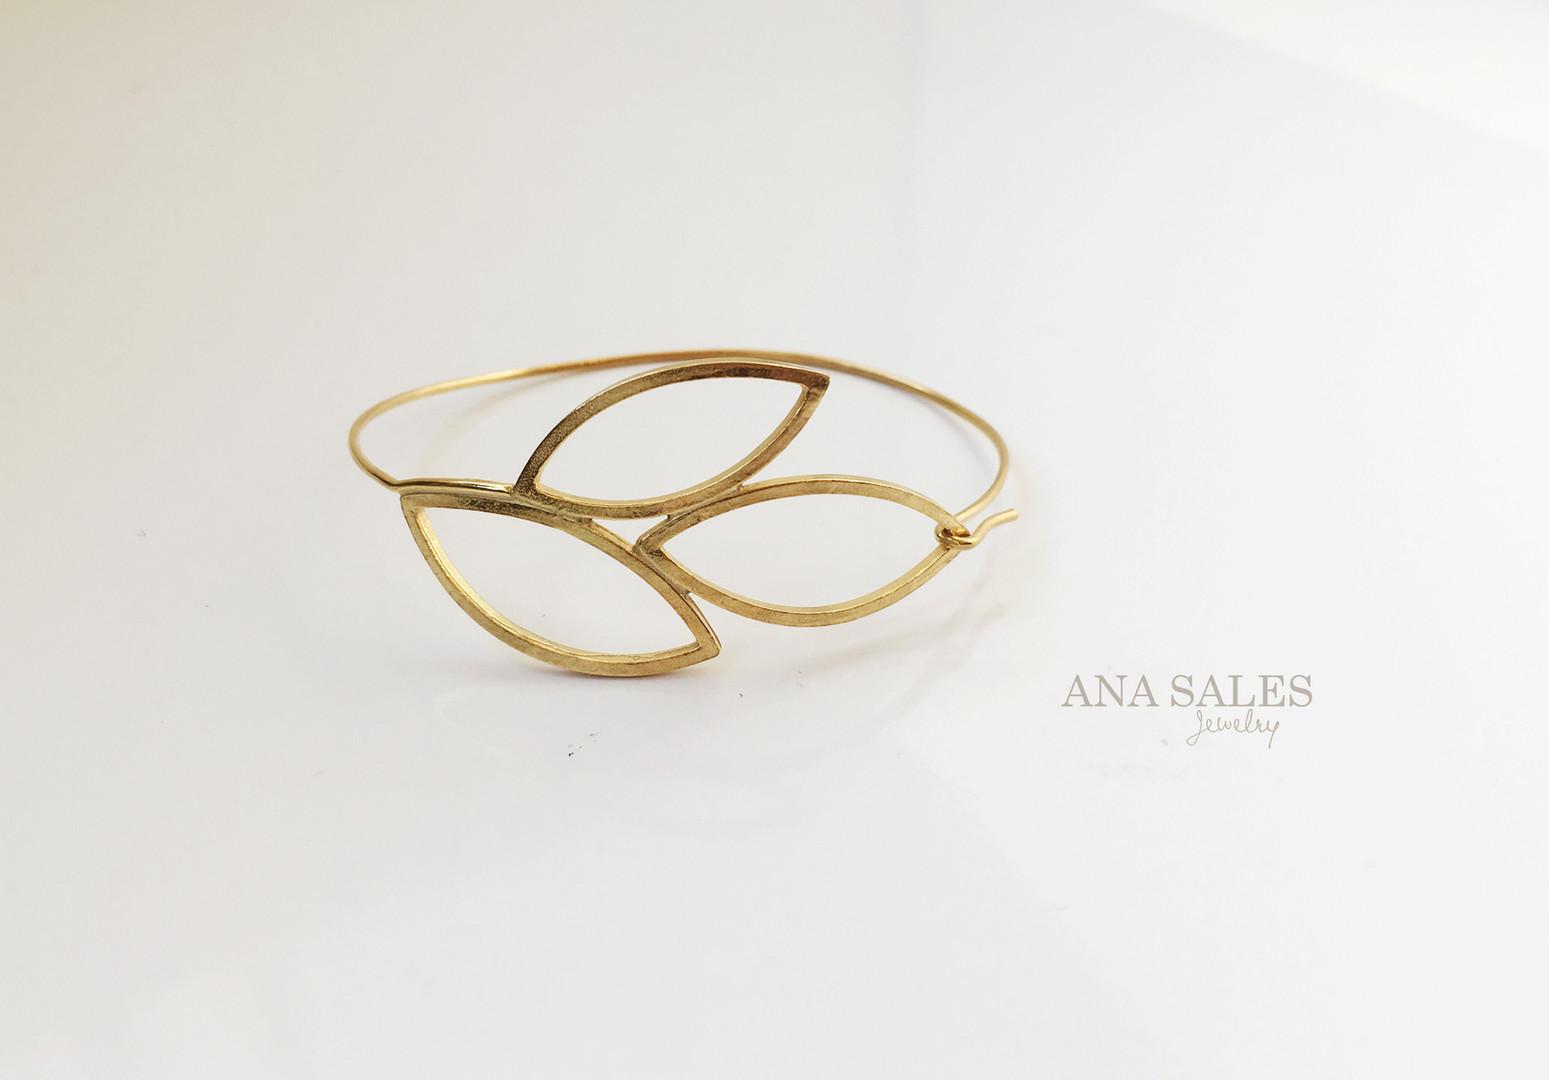 RAMI pulseira | bracelet